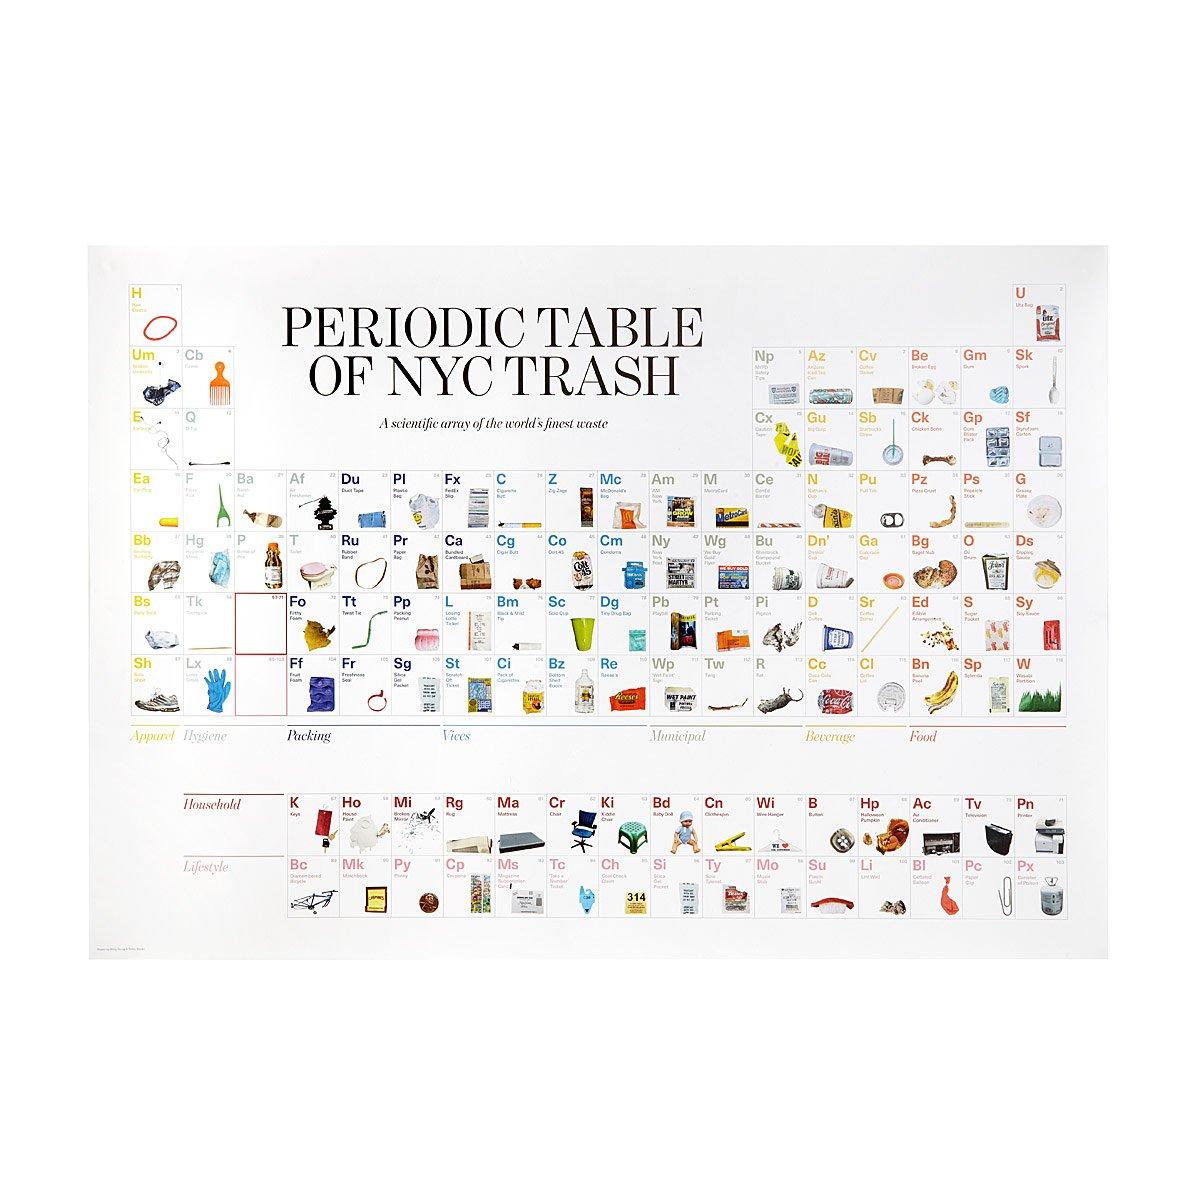 Periodic table of nyc trash garbage infographic uncommongoods periodic table of nyc trash 1 thumbnail gamestrikefo Gallery